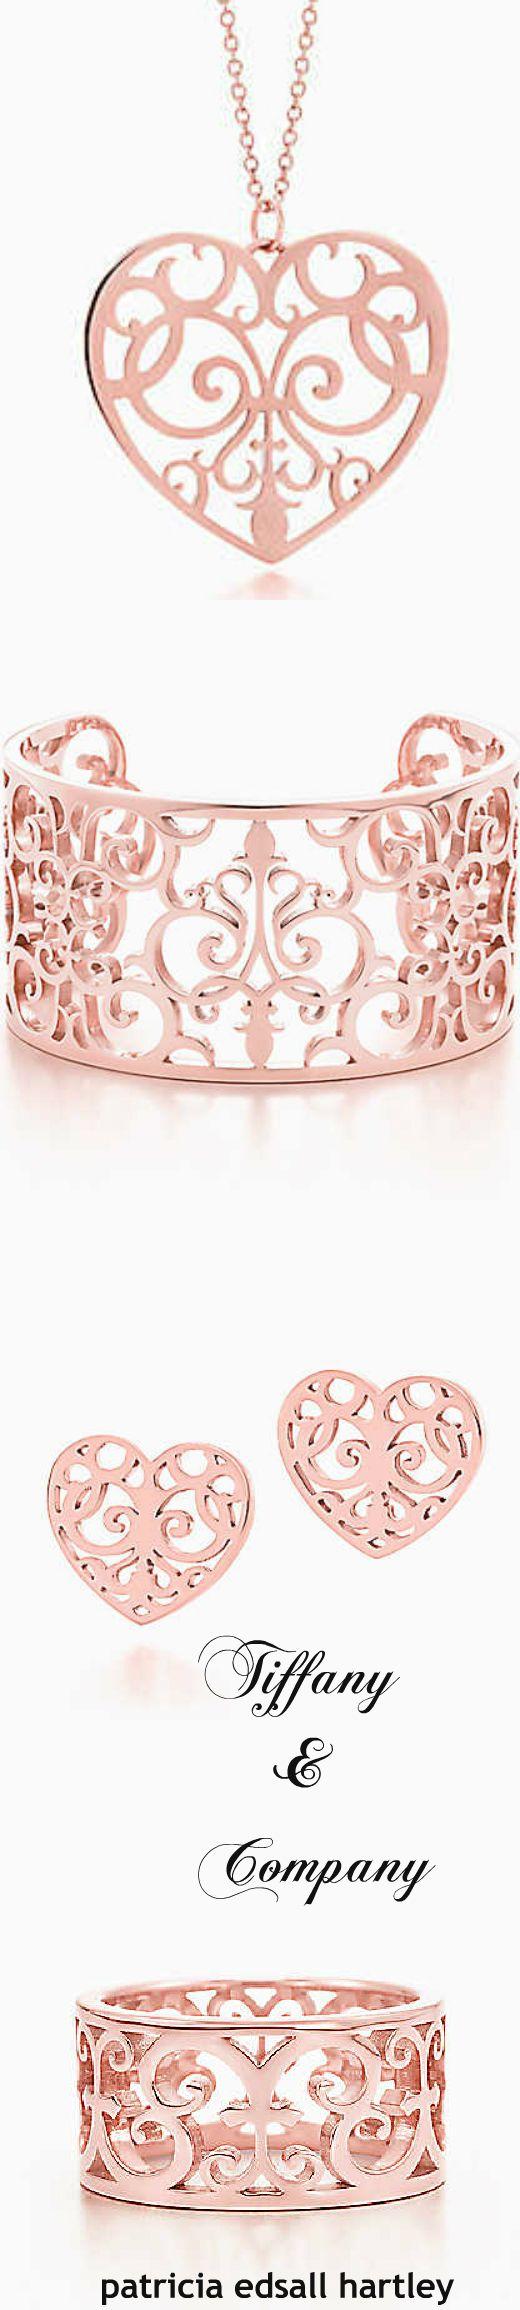 Simply stunning.  Tiffany & Co. | House of Beccaria~. #jewelry #Tiffany